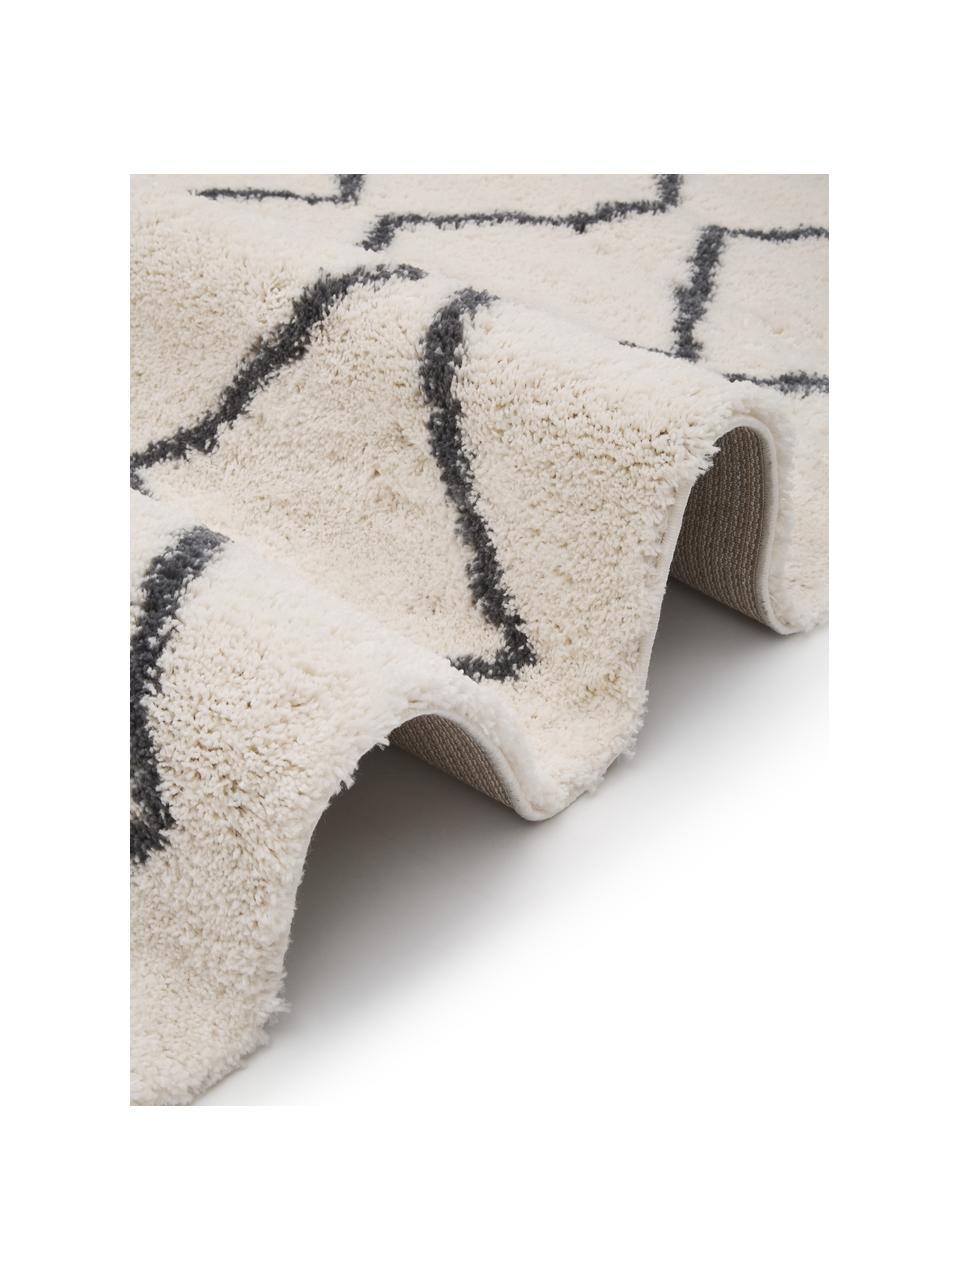 Passatoia a pelo lungo bianco crema/grigio scuro Velma, Retro: 78% juta, 14% cotone, 8% , Bianco crema, grigio scuro, Larg. 80 x Lung. 250 cm